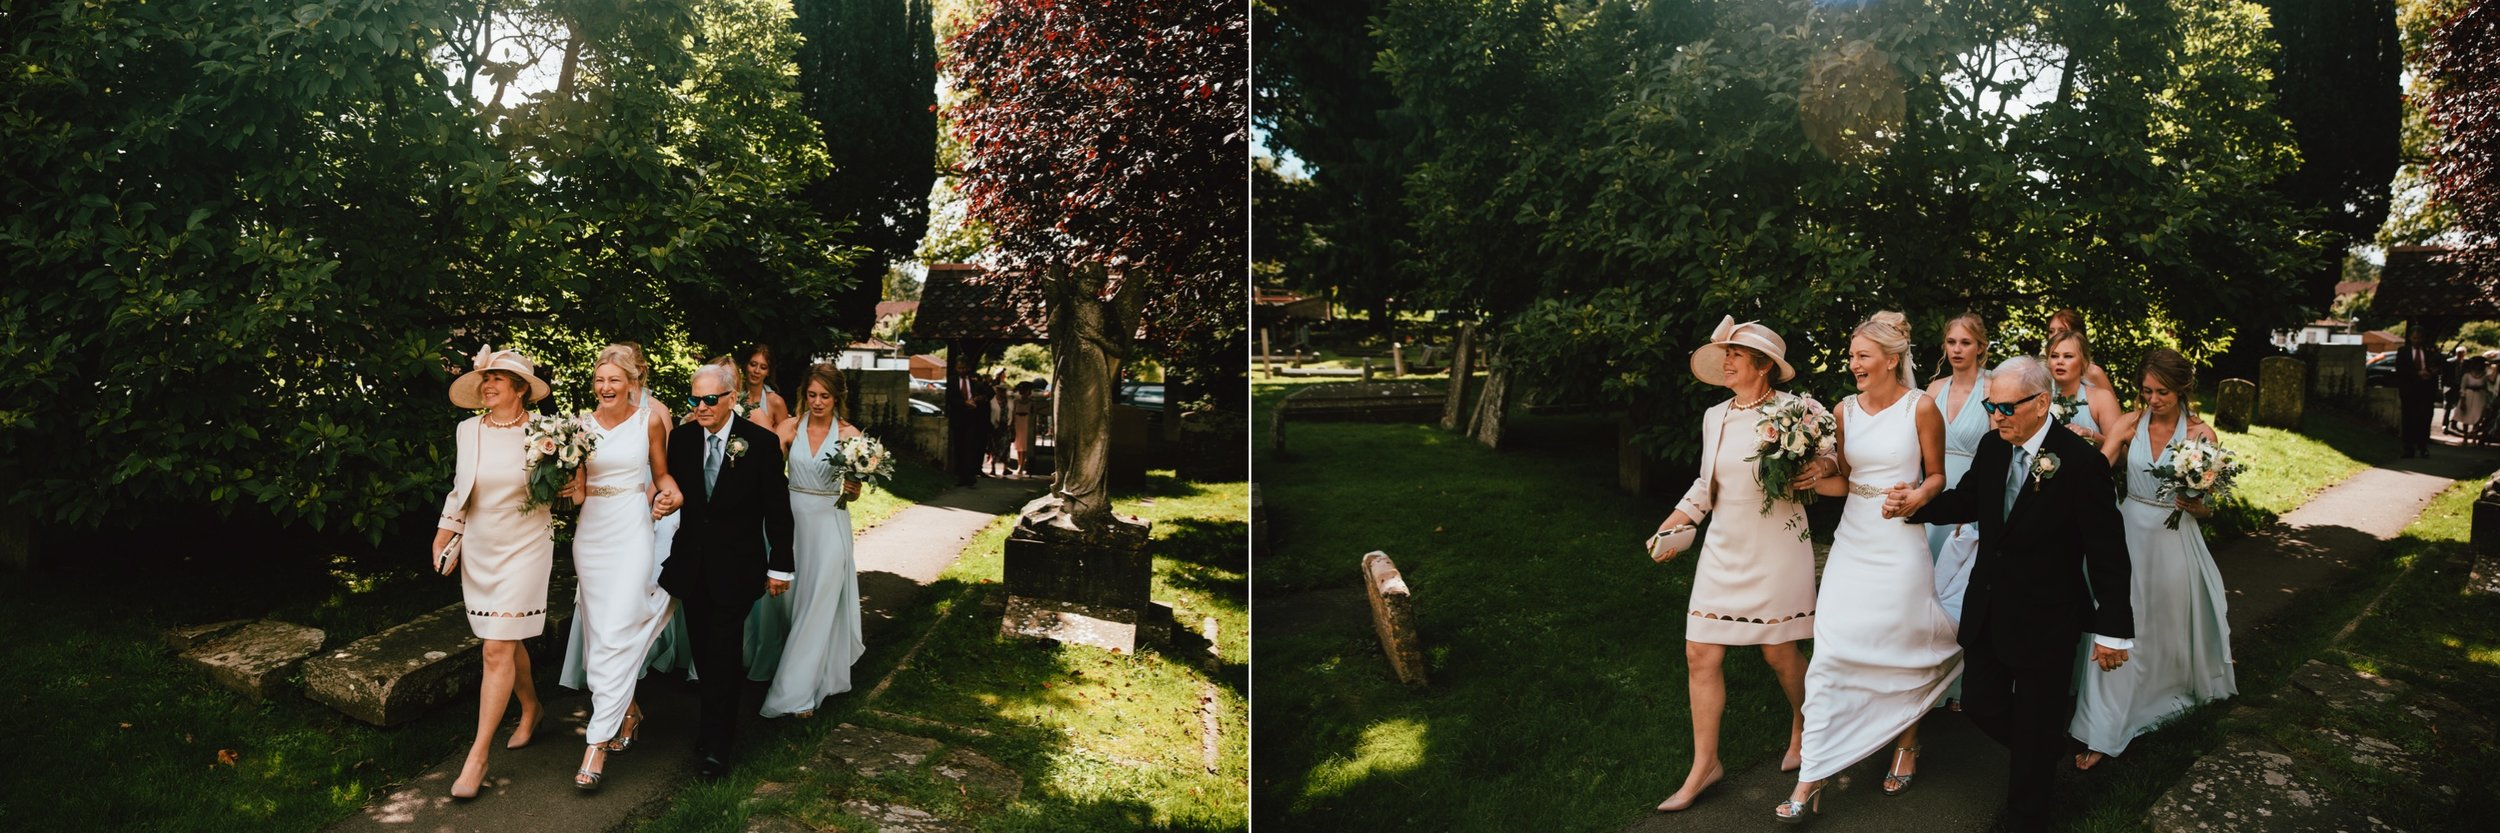 James & Hannah | Oak & Blossom0011.jpg